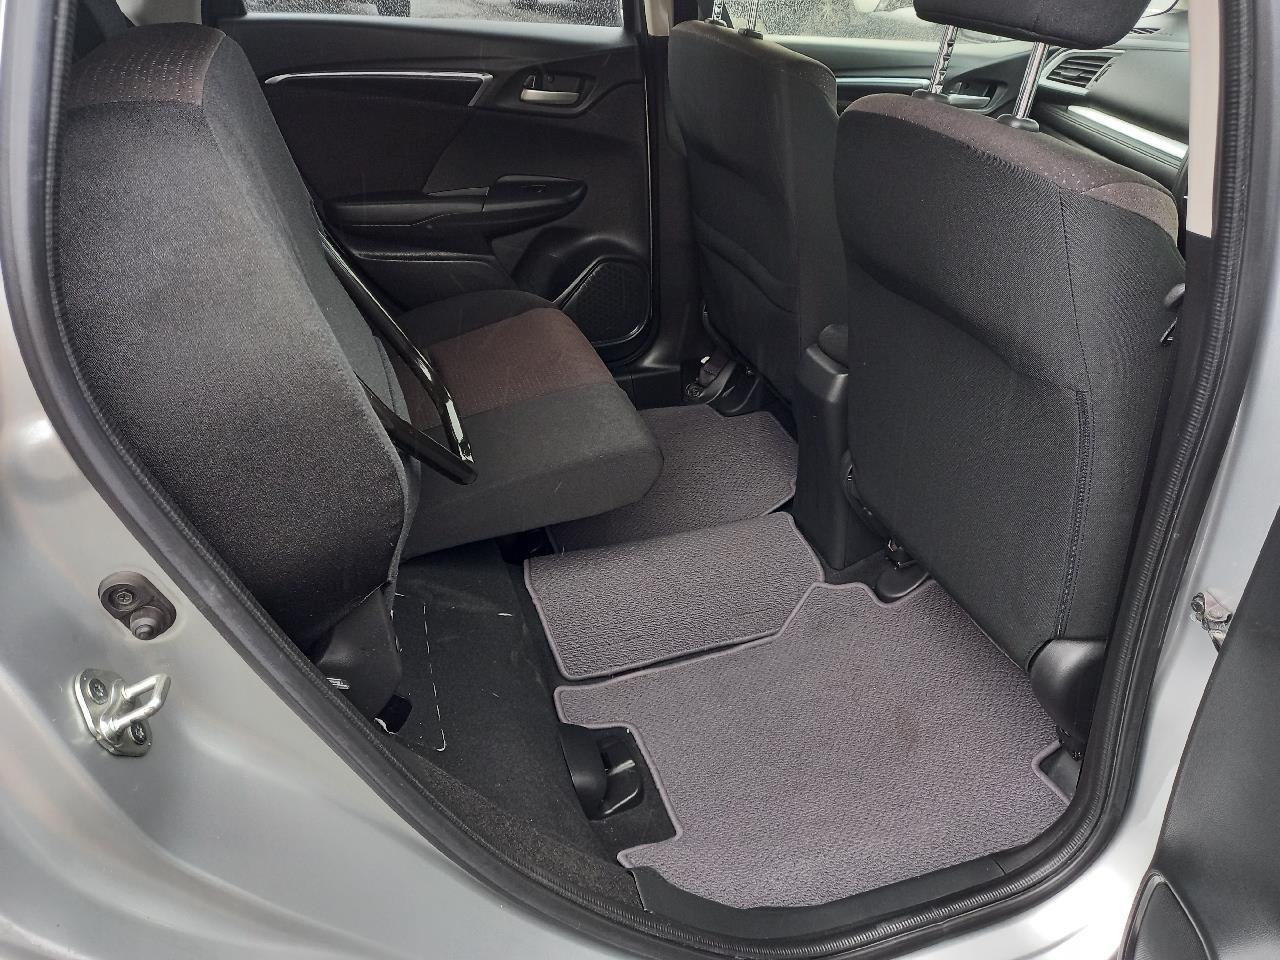 image-9, 2015 Honda Fit Hybrid No Deposit Finance at Dunedin